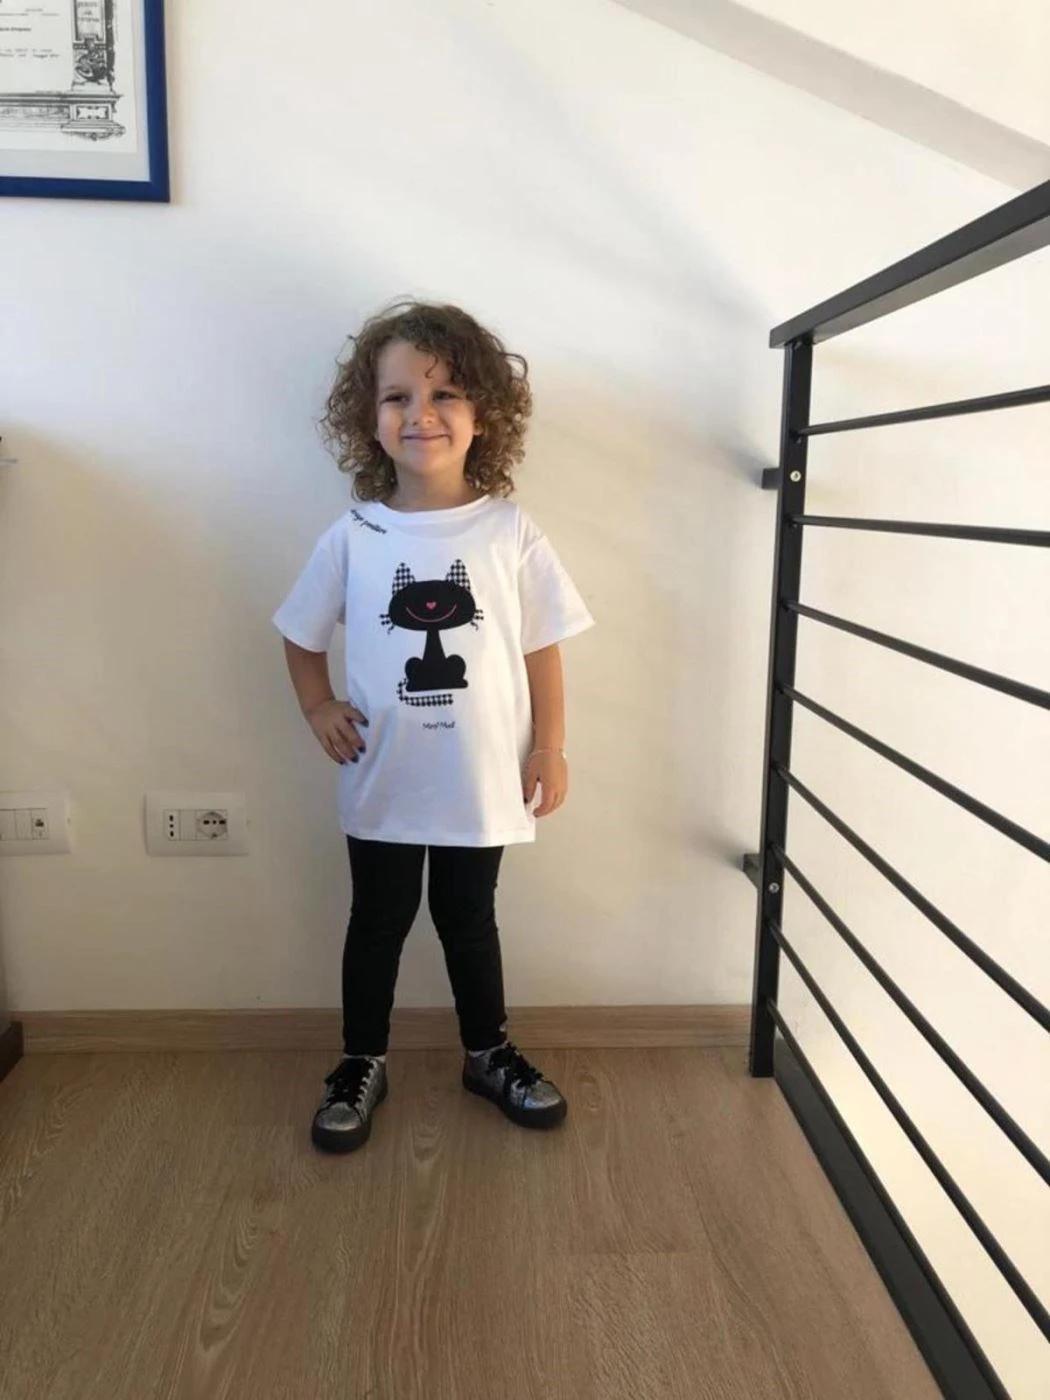 BABY GIRL T-SHIRT WITH KITTEN PIED DE POULE